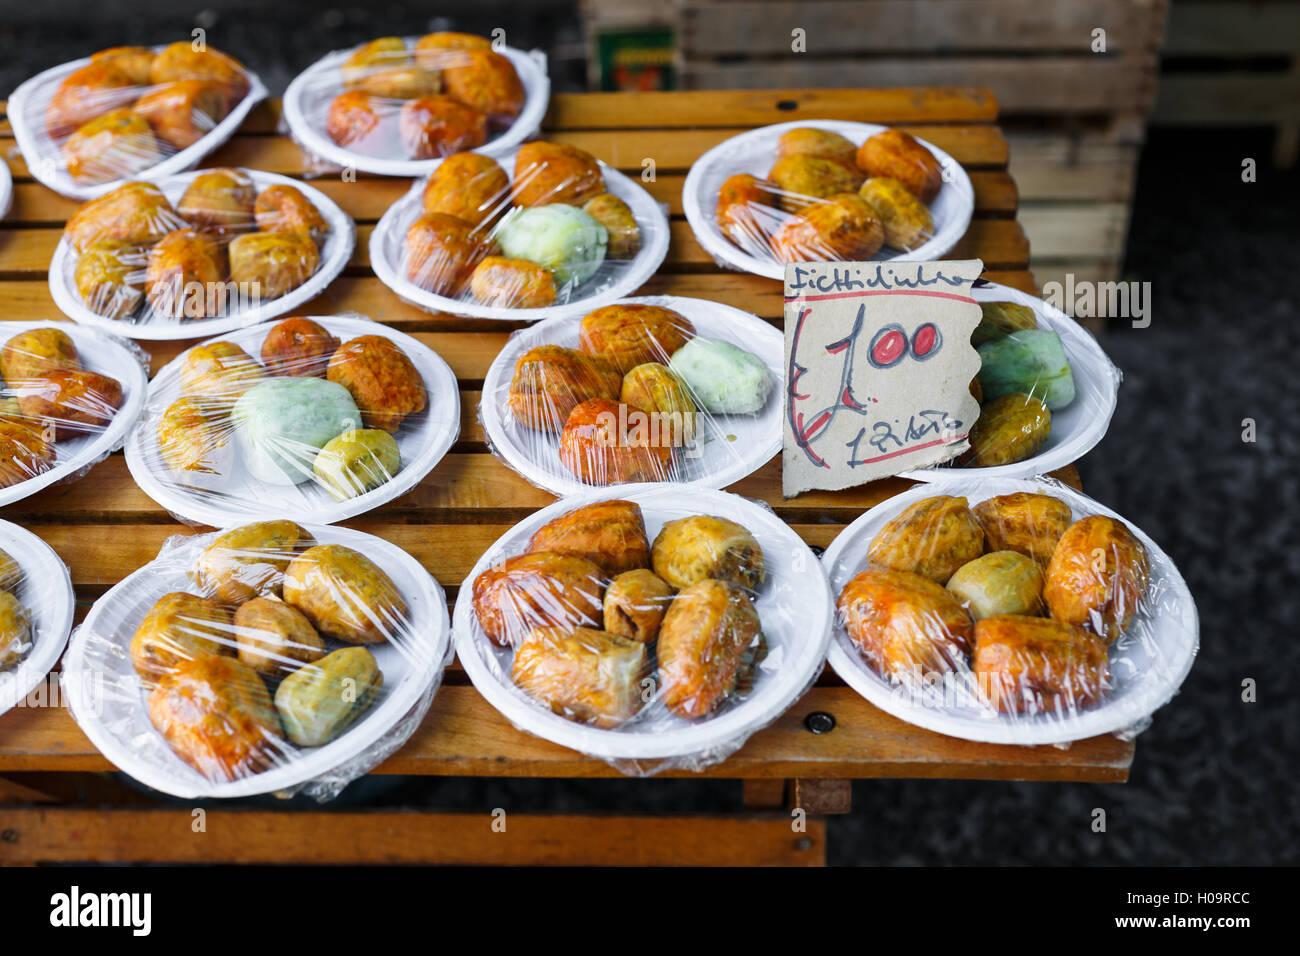 Kaktusfeigen angezeigt am Stall an Ballarò-Markt, Palermo, Sizilien Stockbild